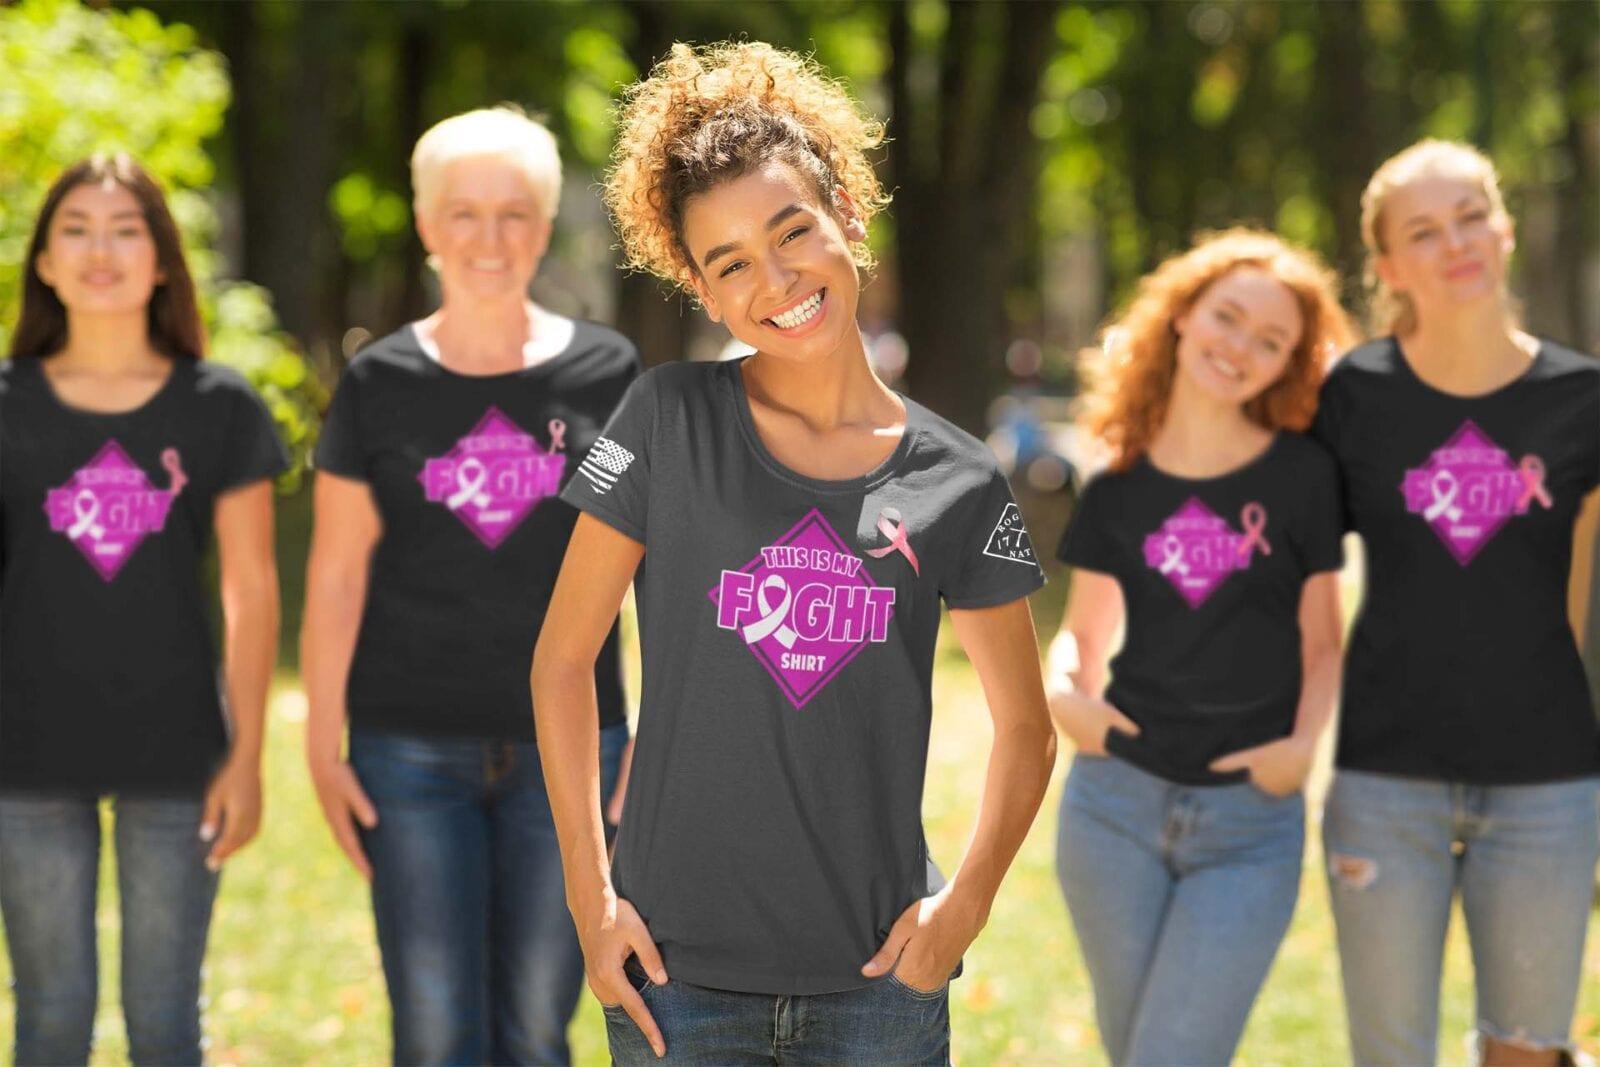 Cancer Awareness Fight Shirt, Group Shot